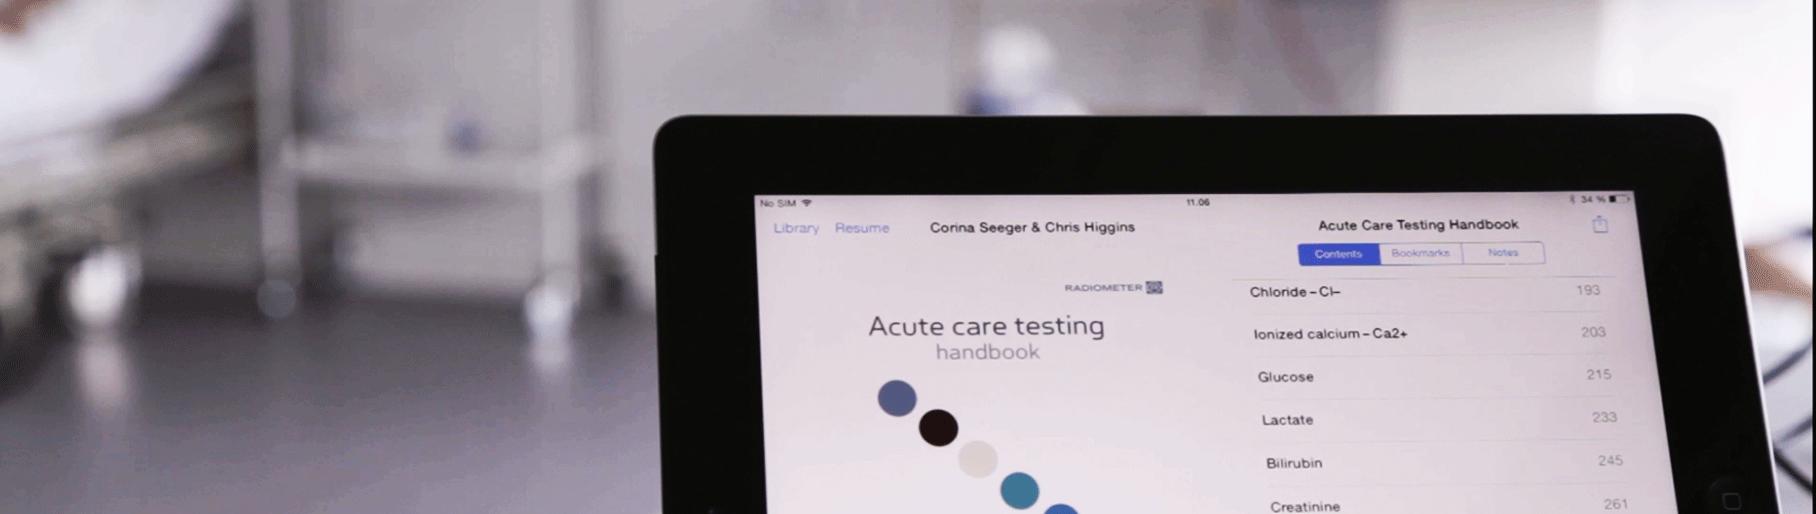 Acute care testing handbook maininnerdesktopandtabletebookipadg fandeluxe Gallery